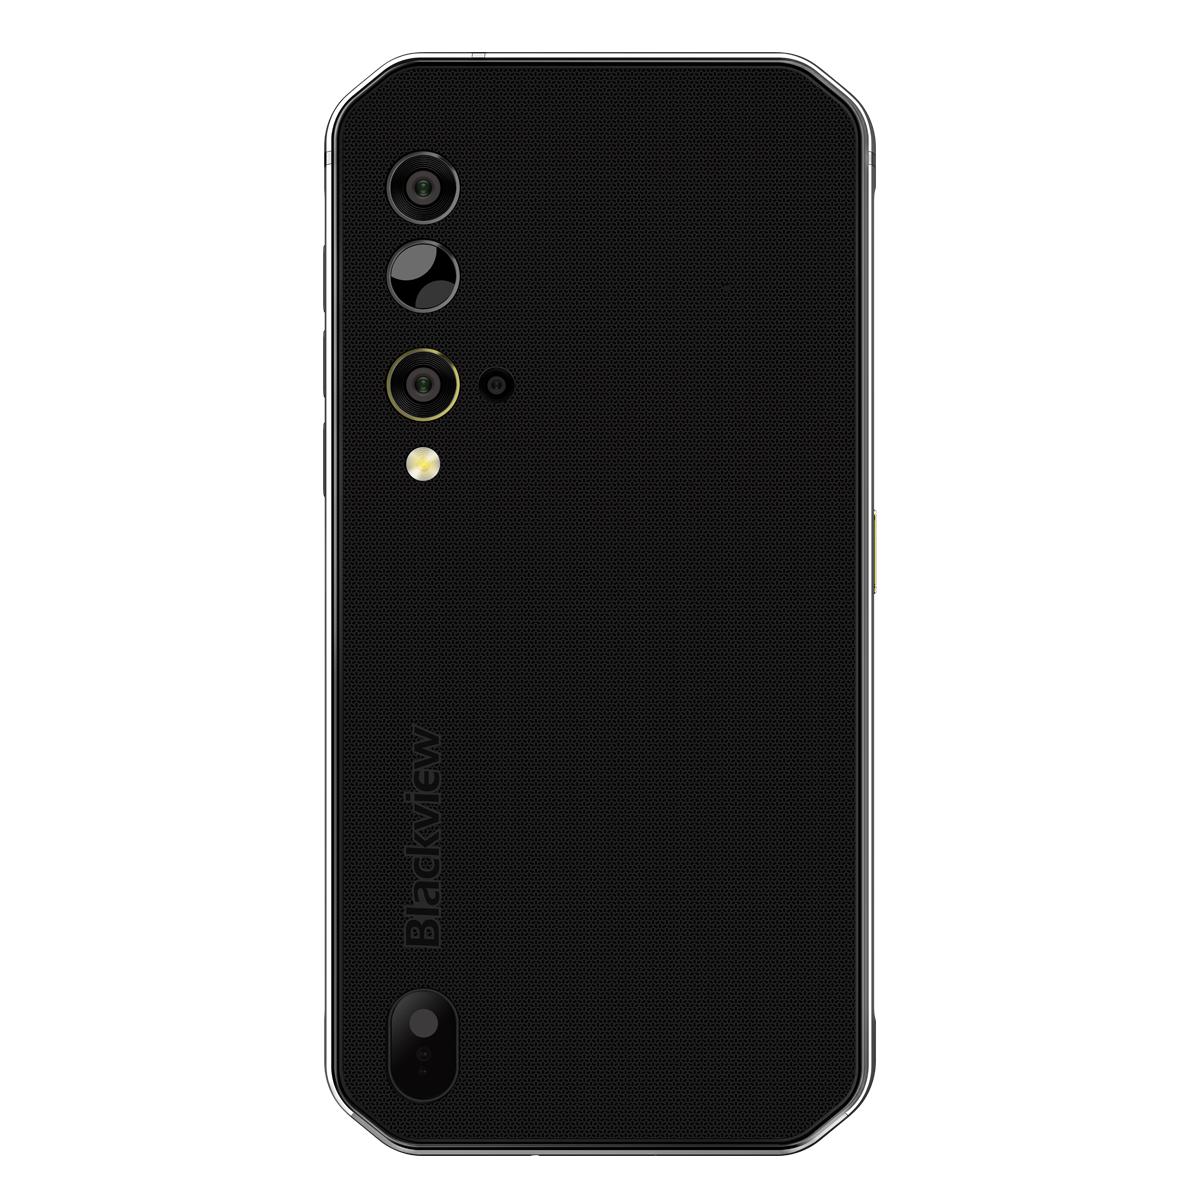 Blackview BV9900 Pro Global Bands IP68/IP69K Waterproof 5.84 inch FHD+ NFC 4380mAh Android 9.0 Thermal by FLIR Camera 8GB 128GB Helio P90 4G Smartphone